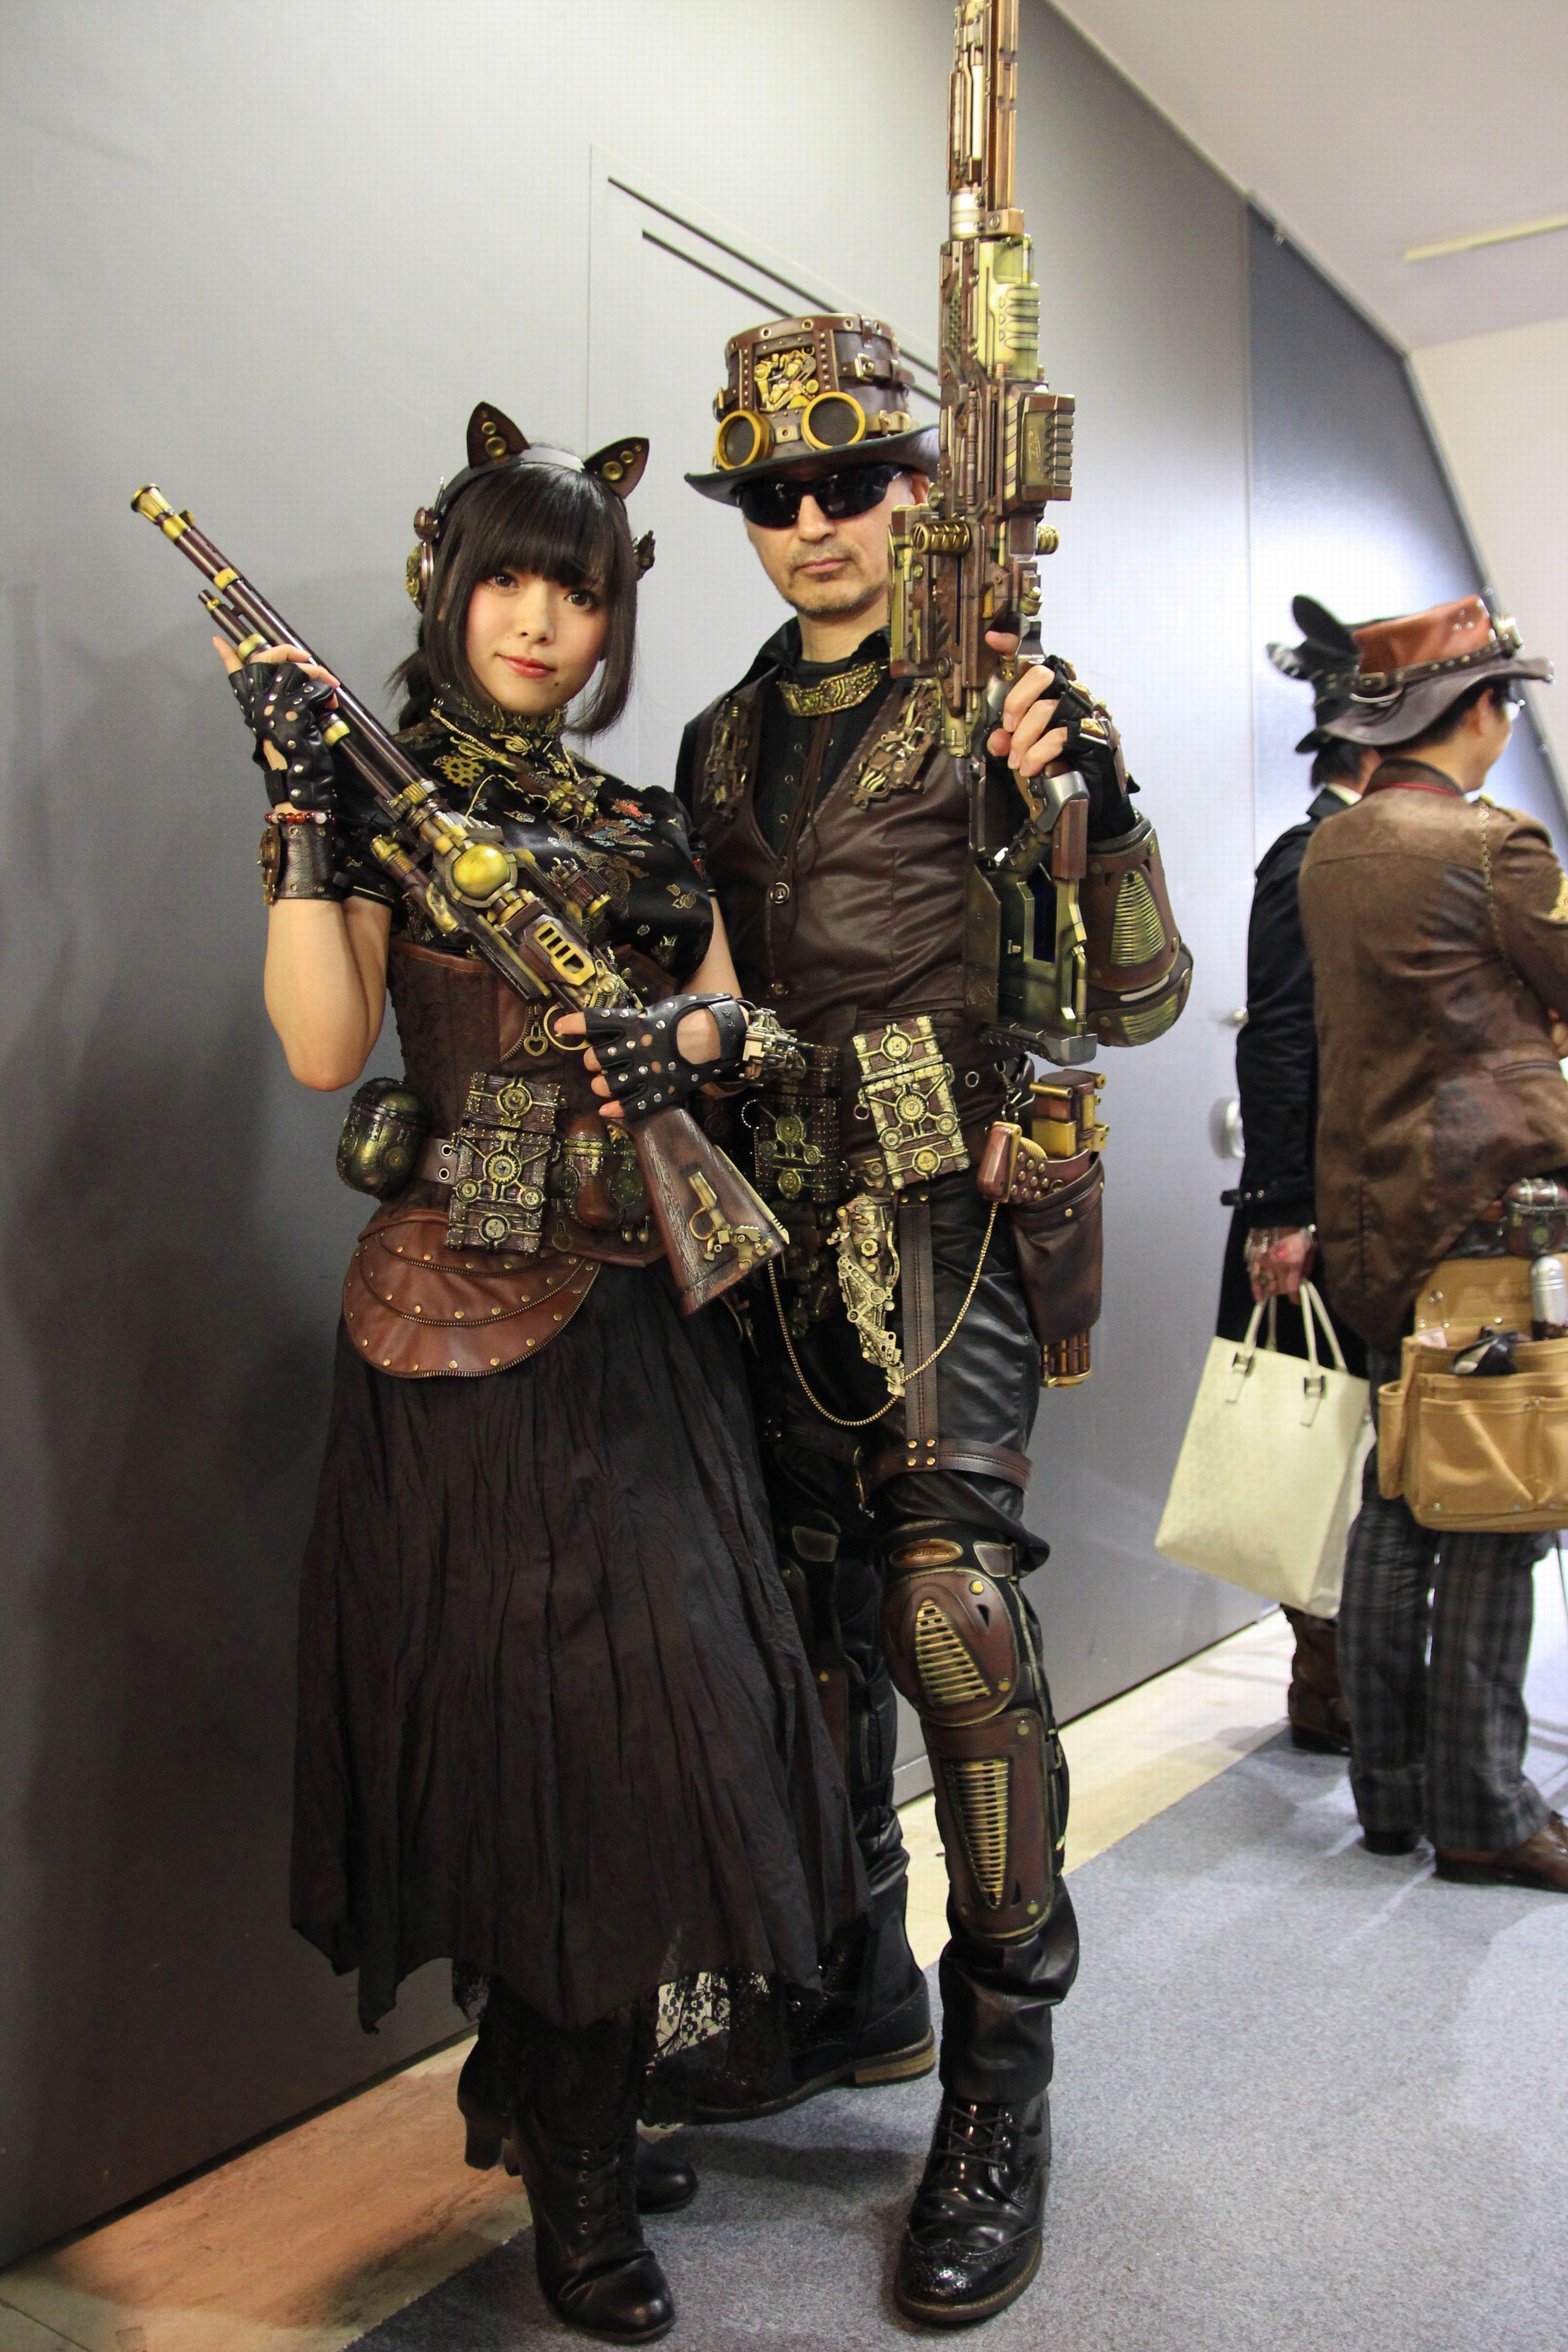 Steam Garden スチームガーデン8 @ ラフォーレ原宿~洋~ゴシック・レザーマスク・ペストマスク・ガントレット・傭兵集団~